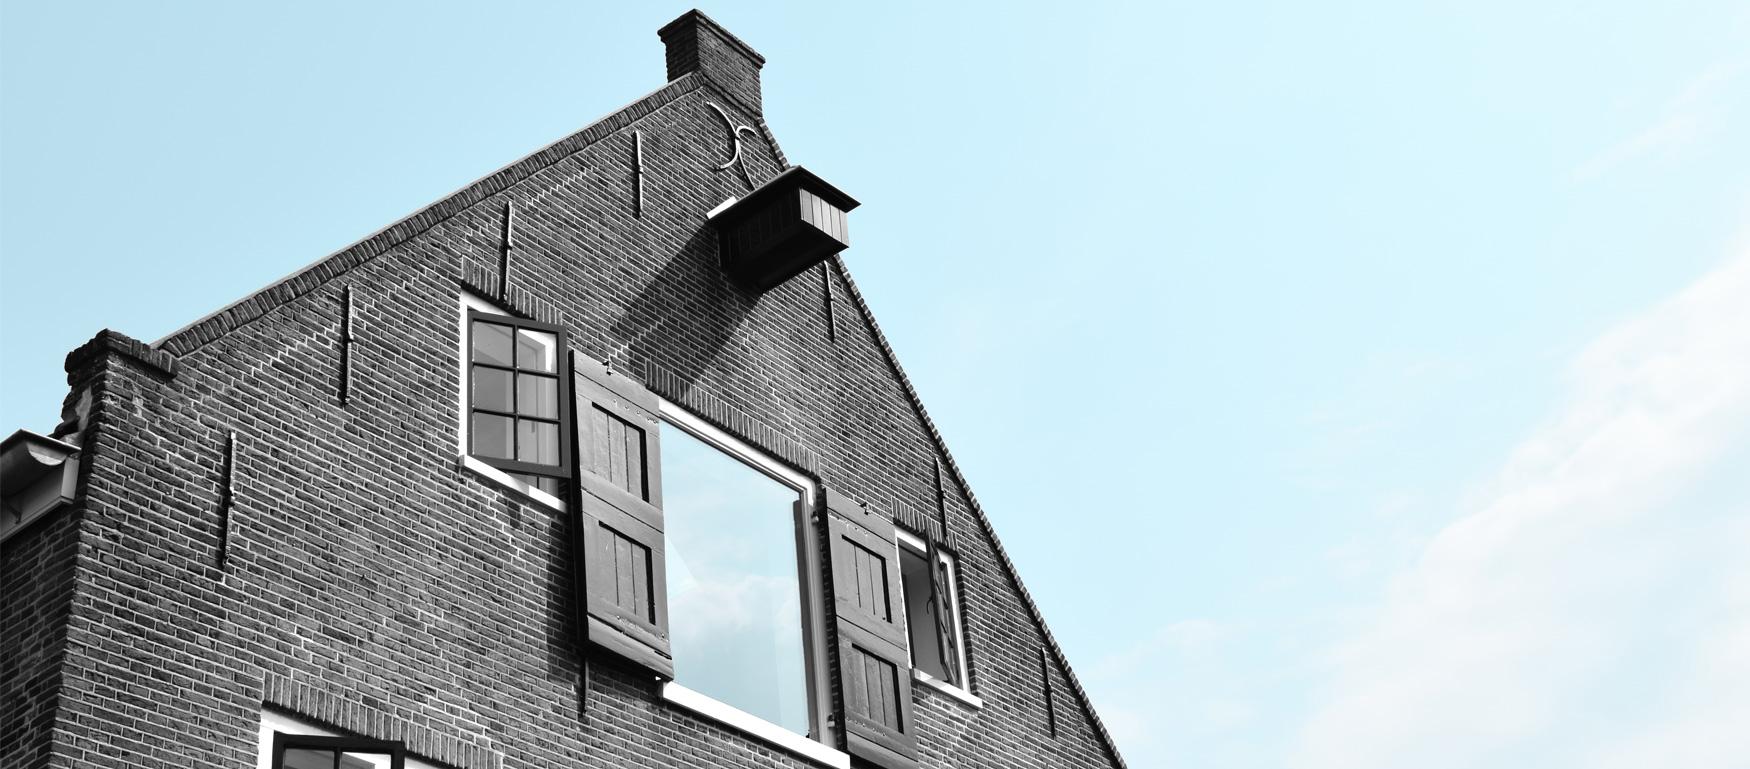 Fier architecten Tabakhuis Nijkerk